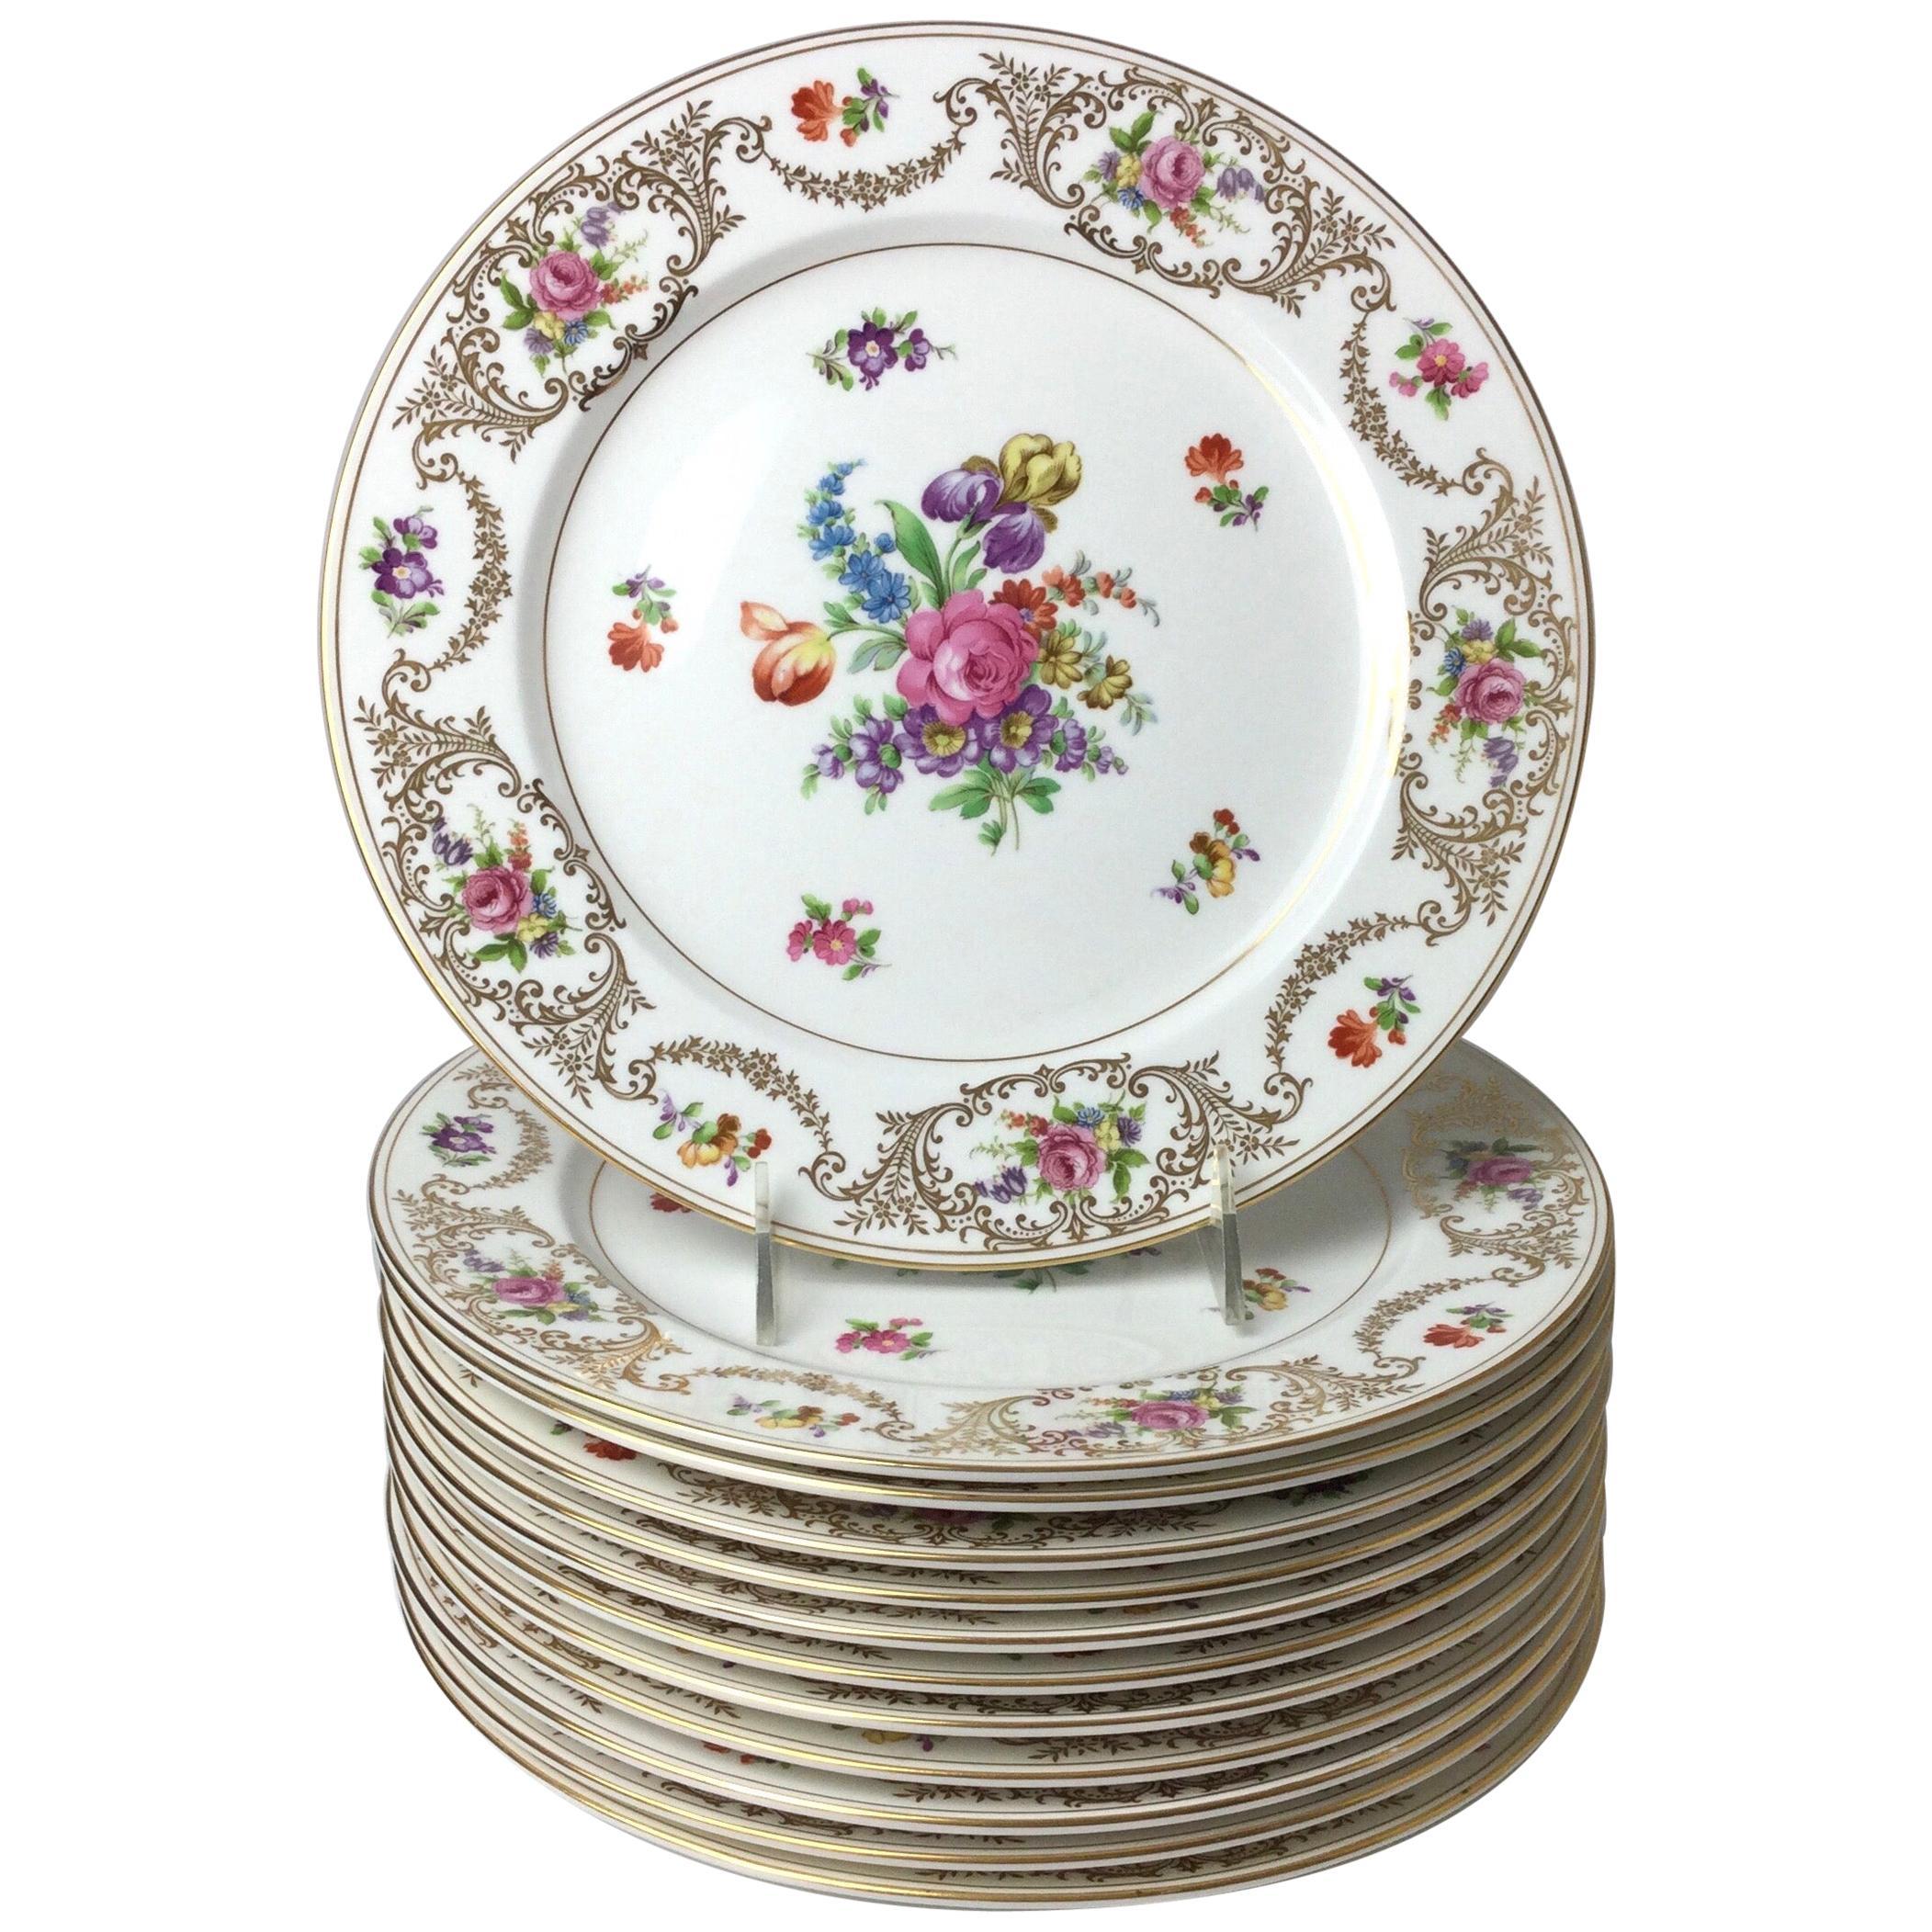 Set of 12 Elaborate Noritake Hand Painted Bone China Service Dinner Plates